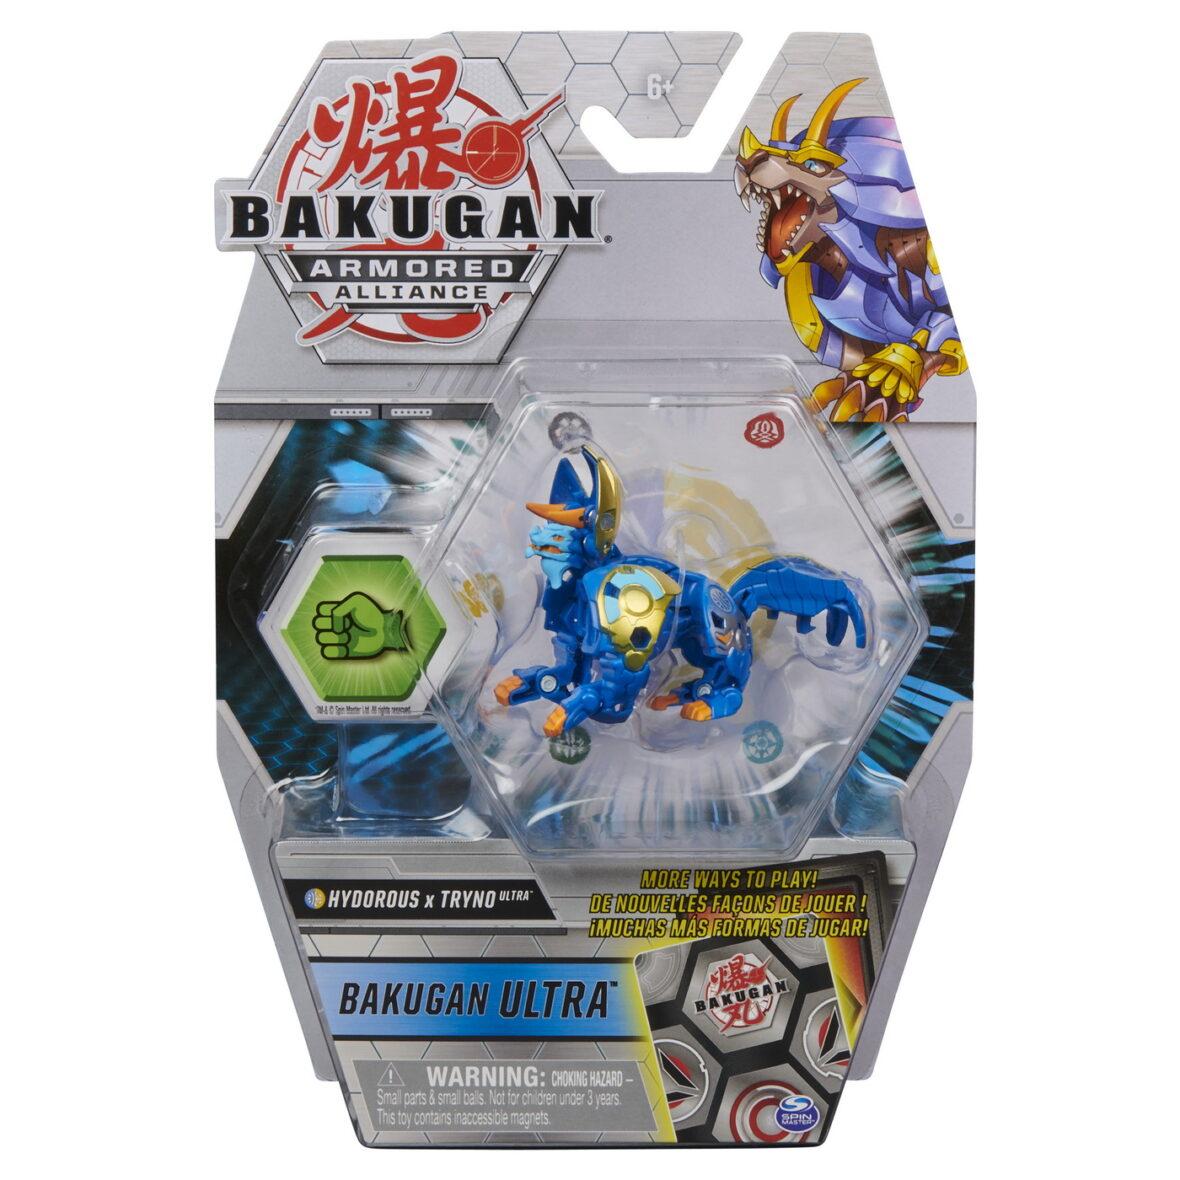 Bakugan S2 Bila Ultra Hydorous Tryno Cu Card Baku-gear